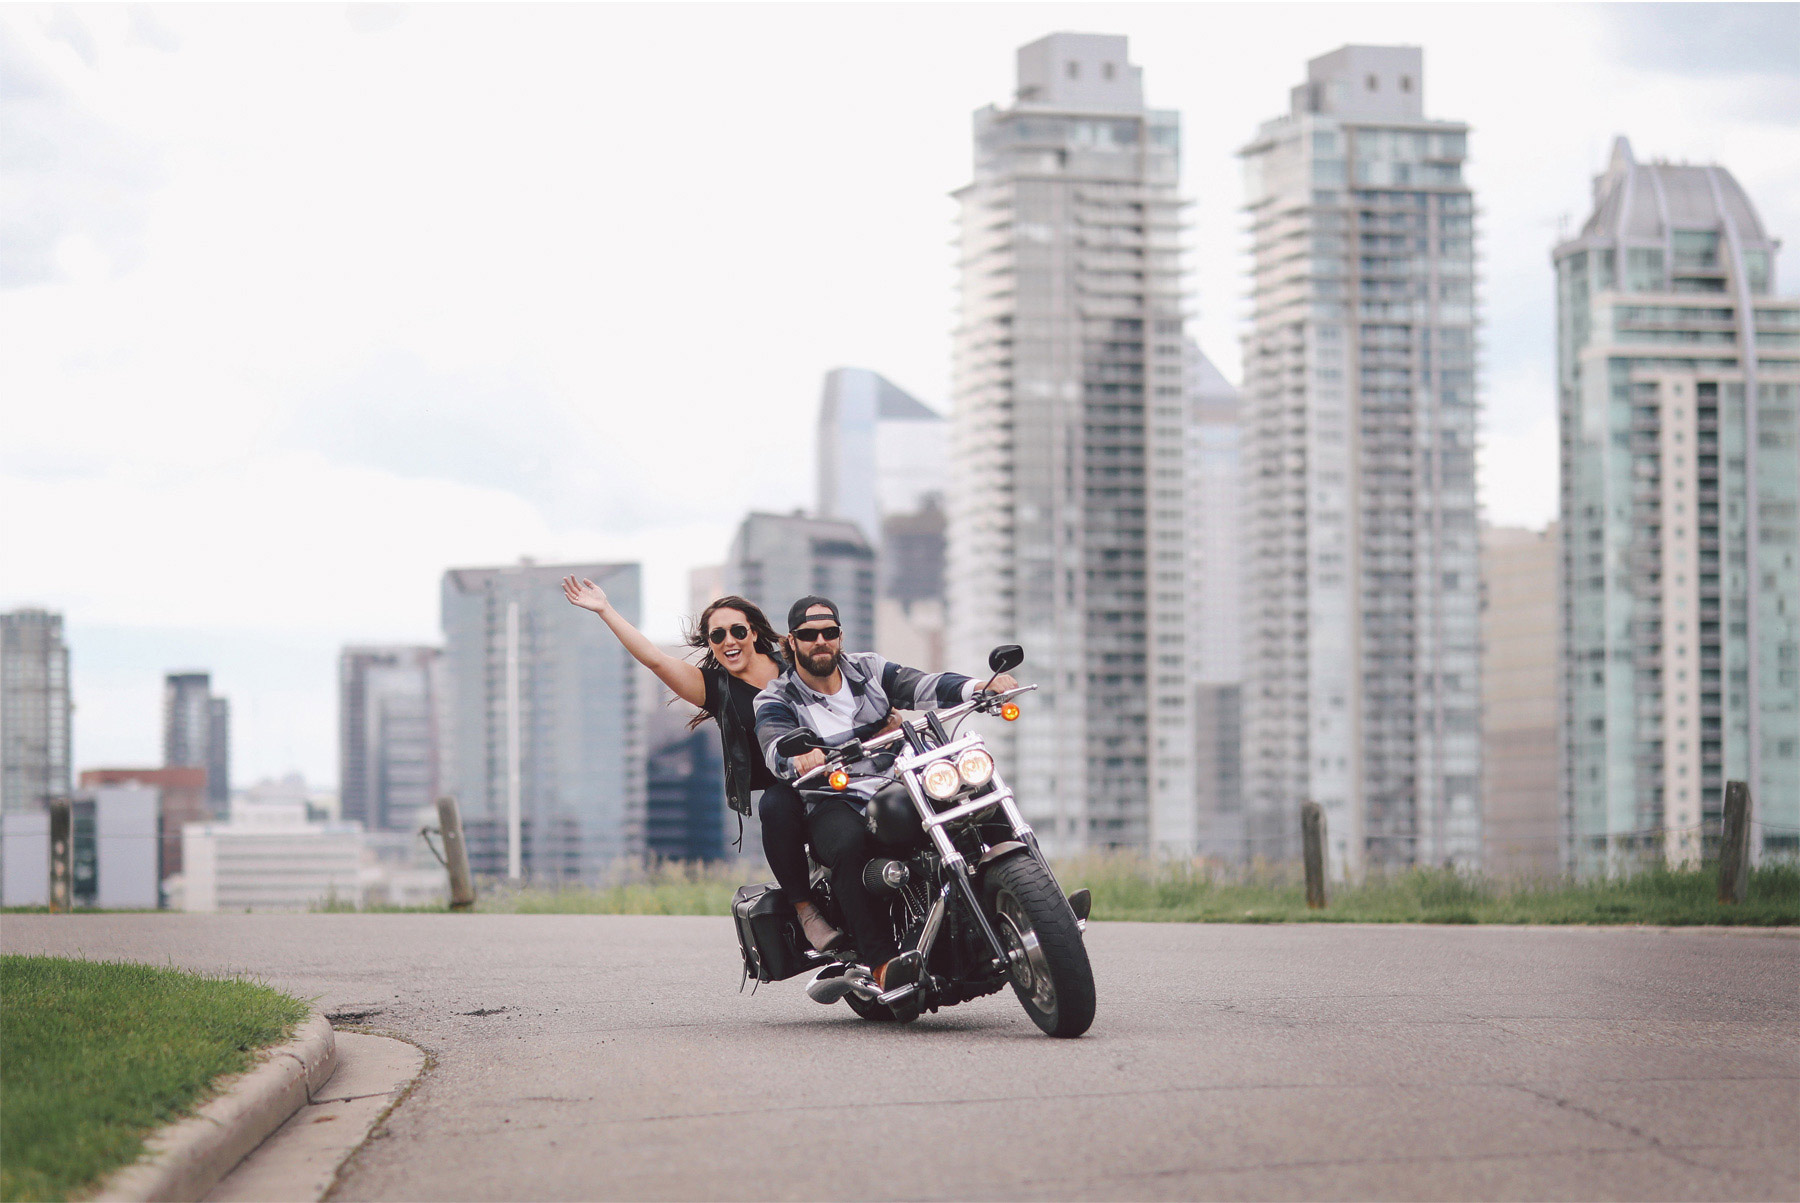 11-Calgary-Canada-Engagement-Photography-by-Vick-Photography-Bikers-Harley-Davidson-Skyline-Lizz-and-Brady.jpg